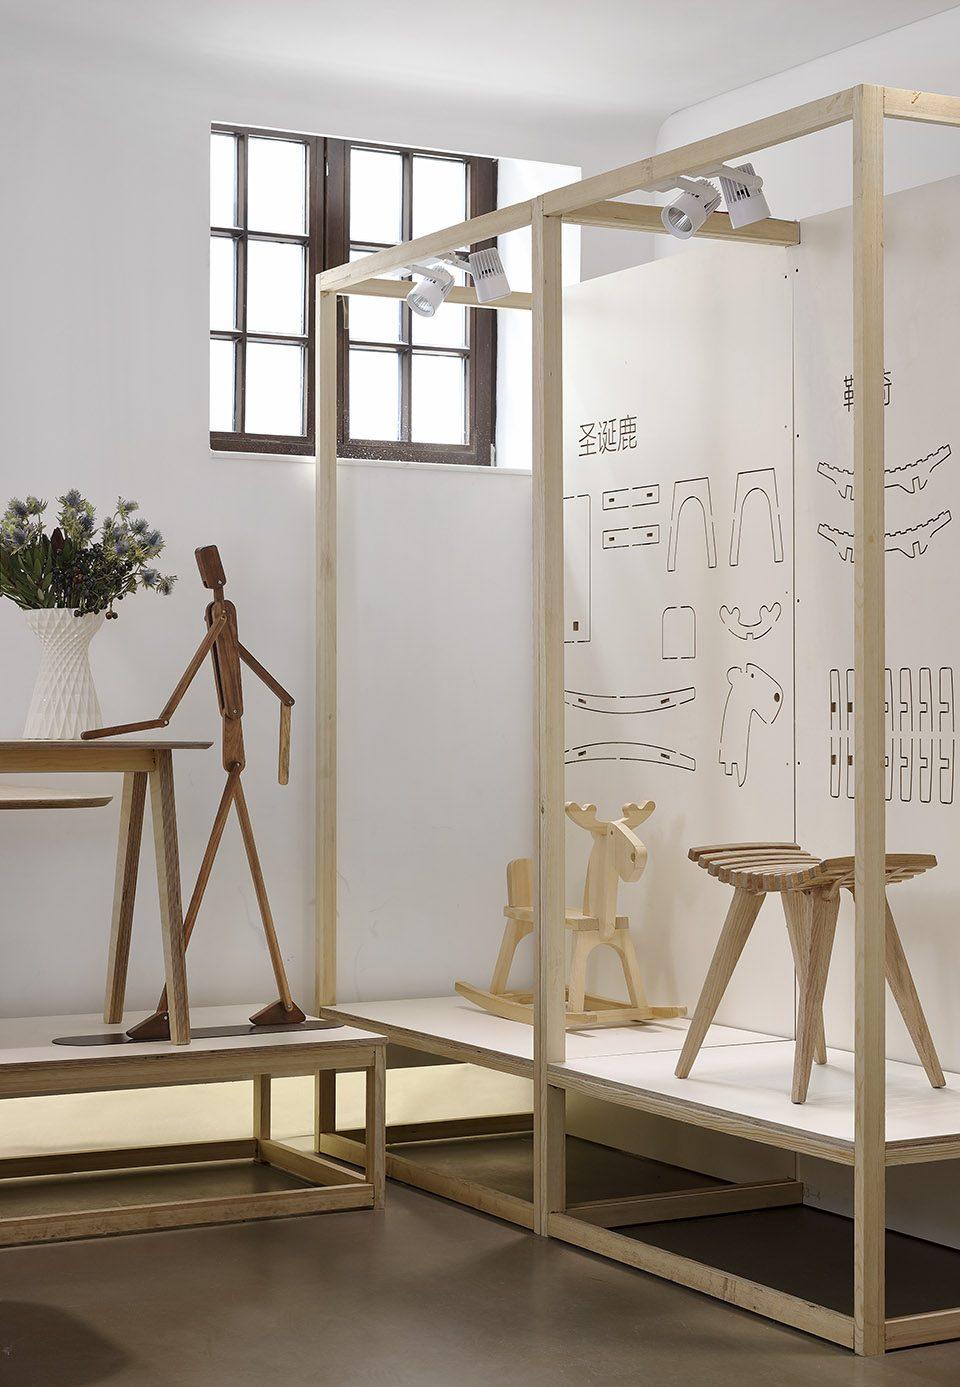 retail-section_05_dot-make-popup-store_dot-architects-960x1387